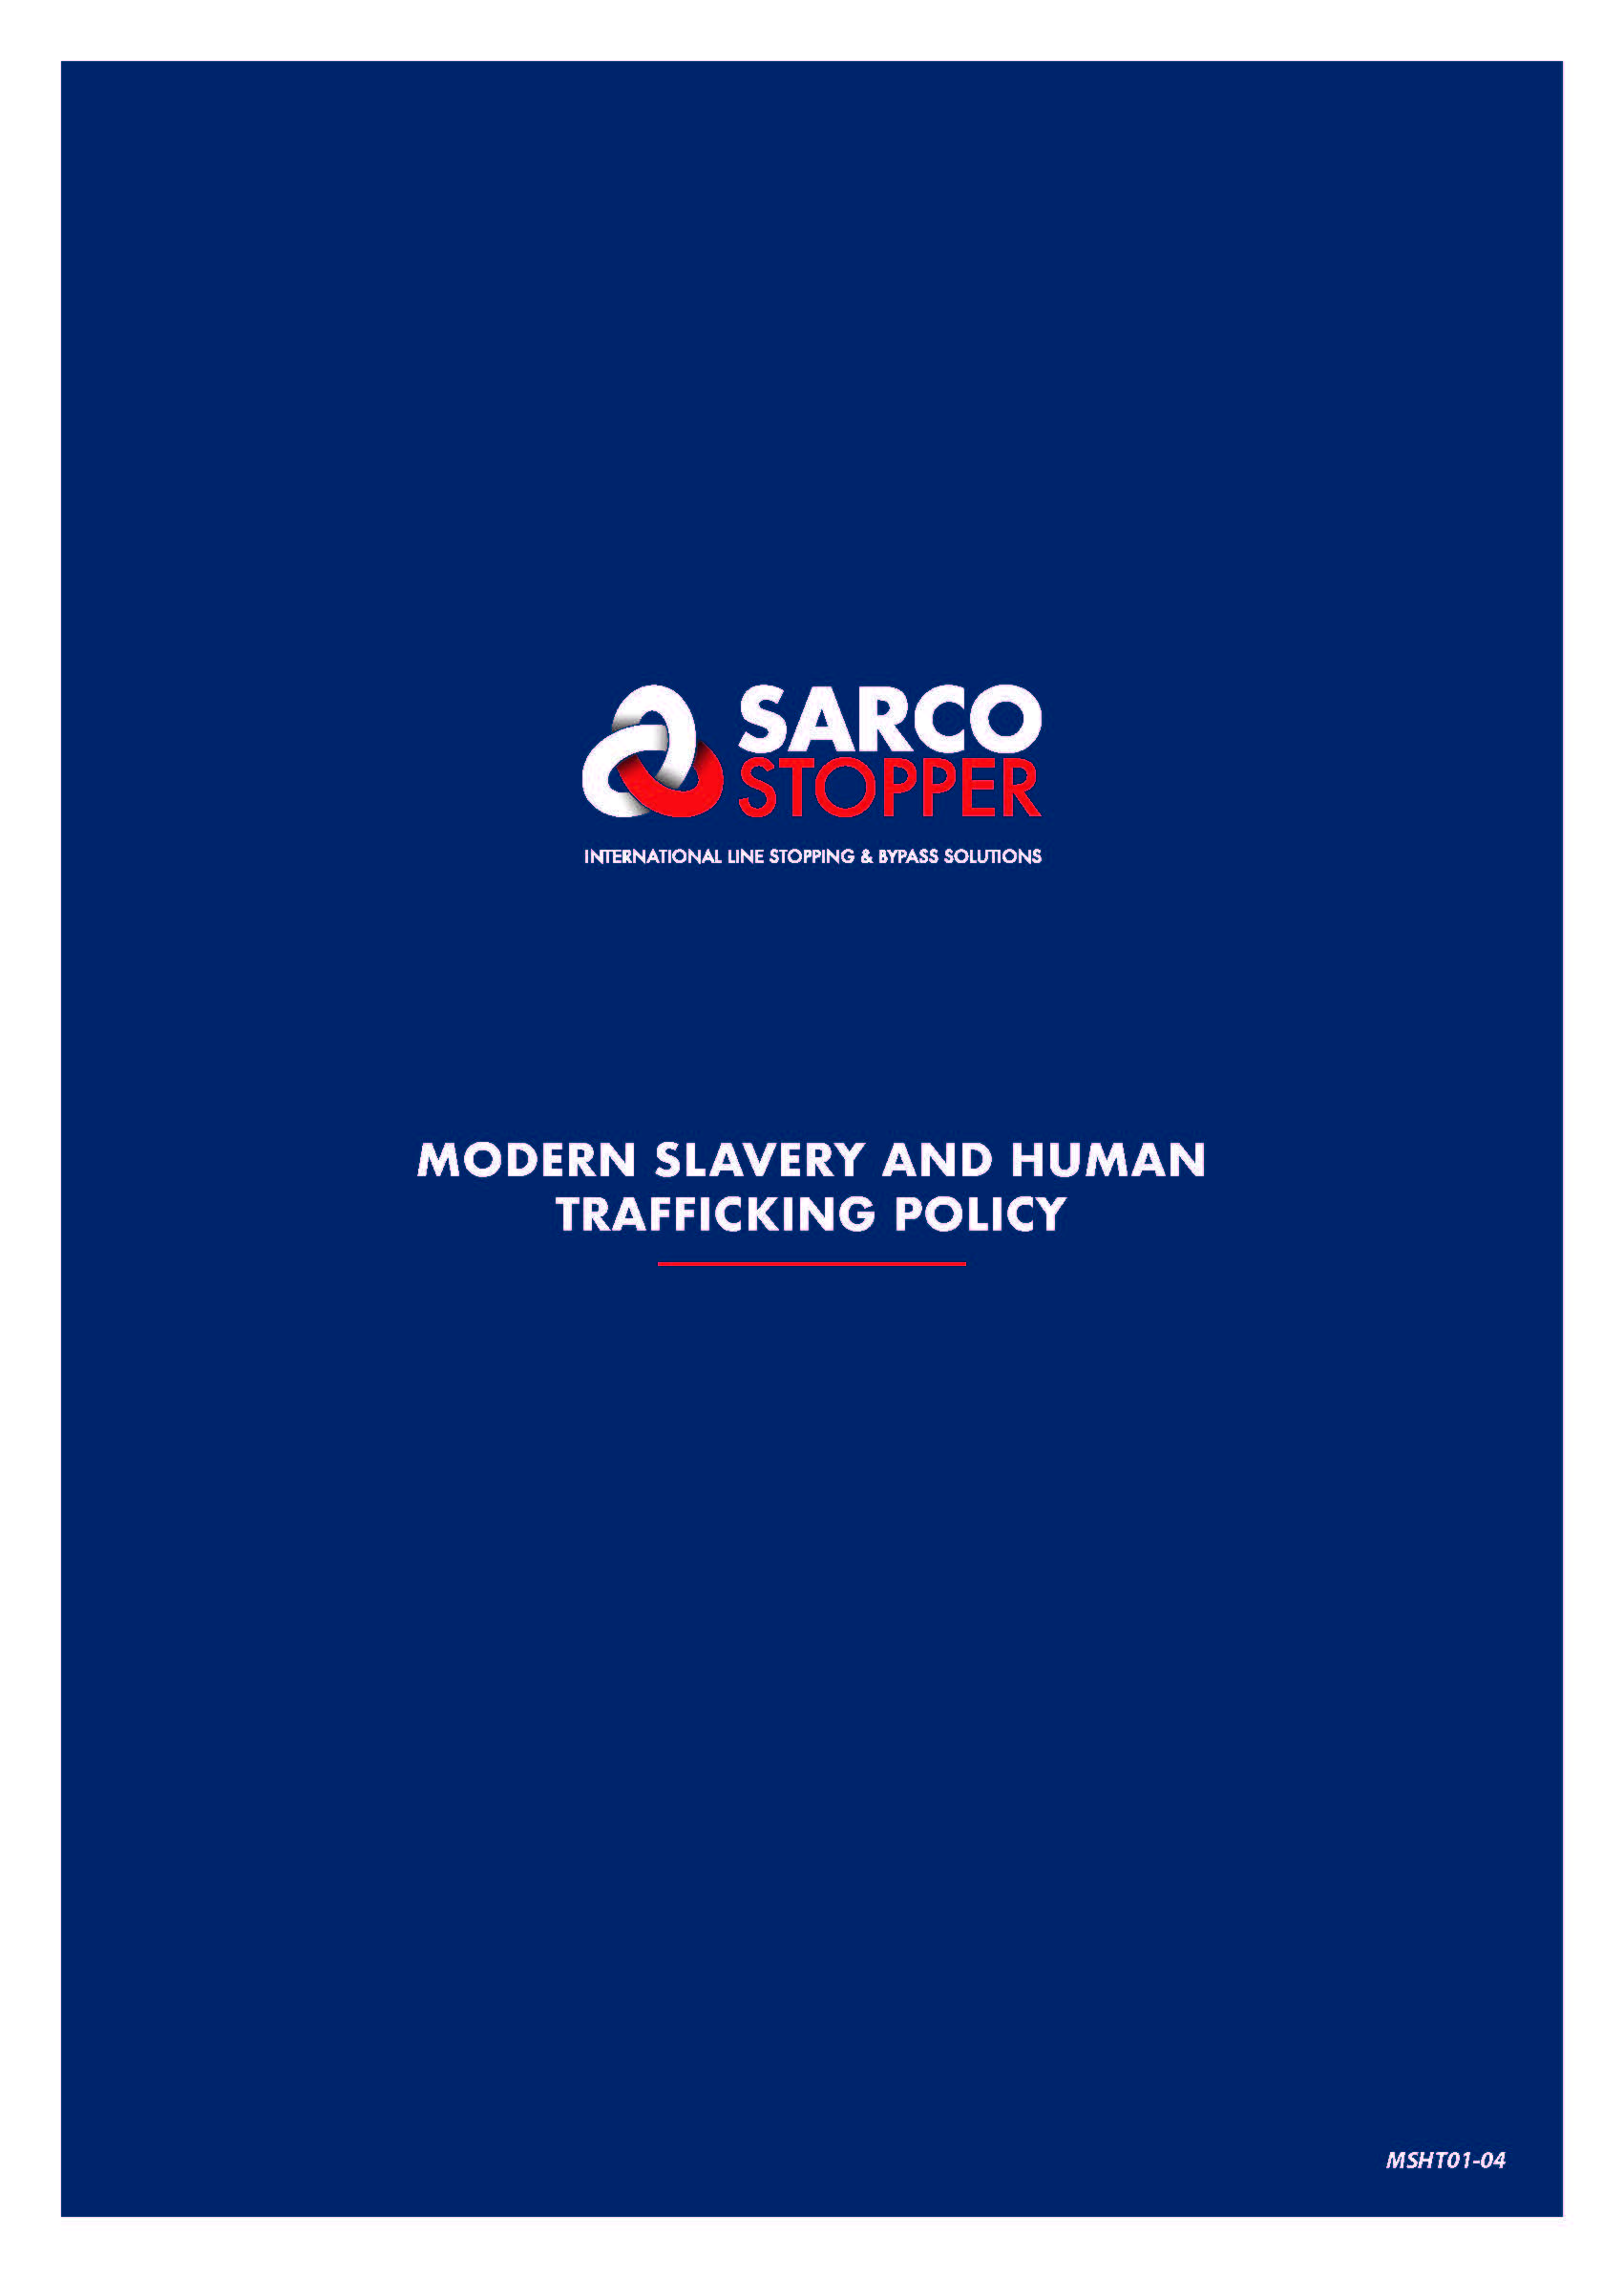 MSHT01-04 Modern Slavery Human Trafficking PolicyC